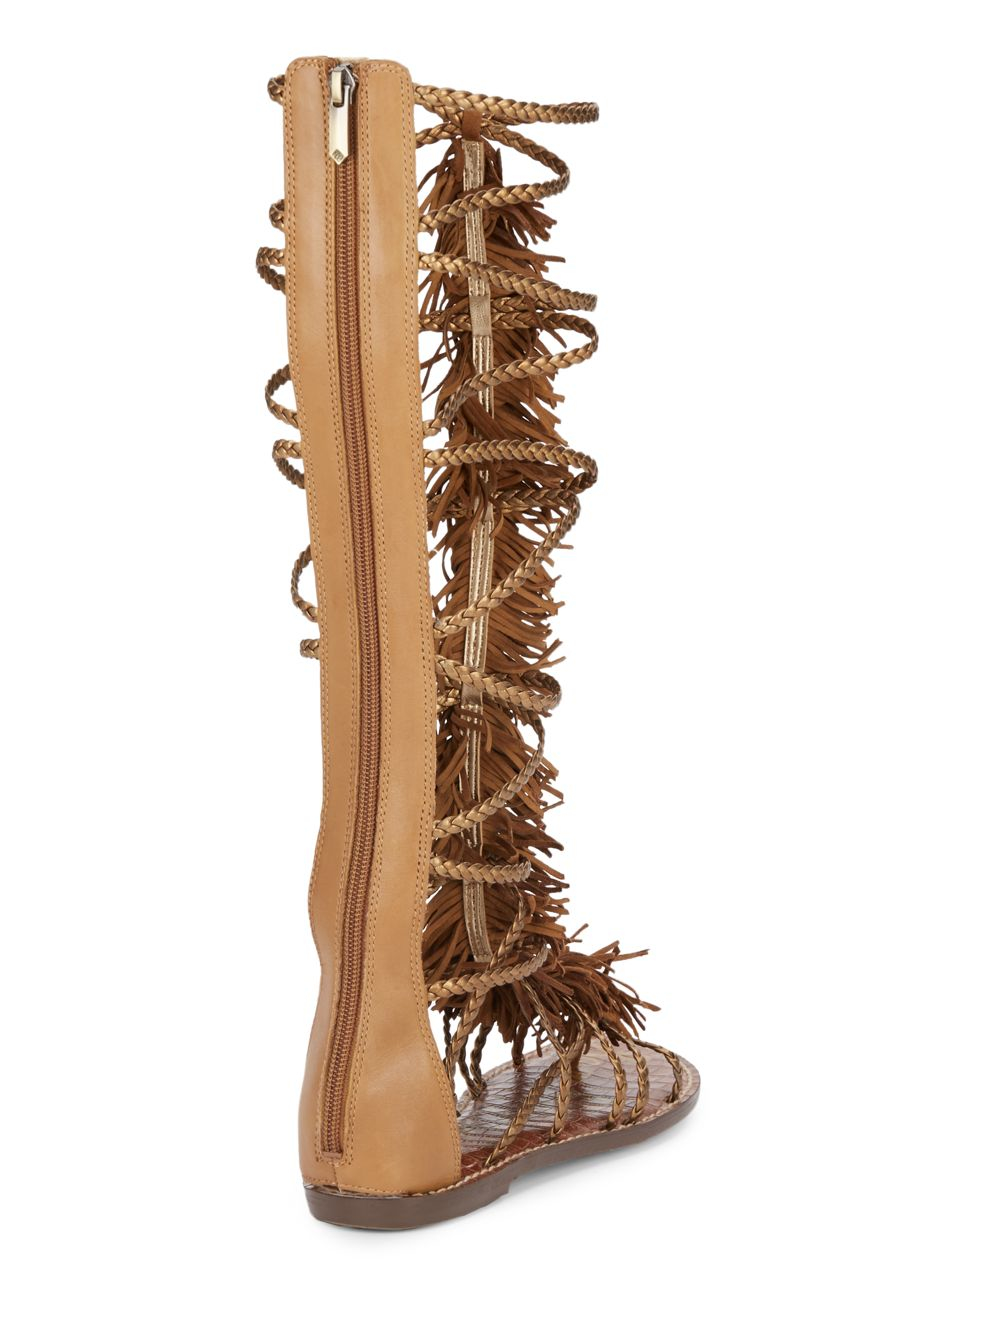 5401279a2d79f Sam Edelman Gia Fringed Knee-high Metallic Leather Gladiator Sandals ...